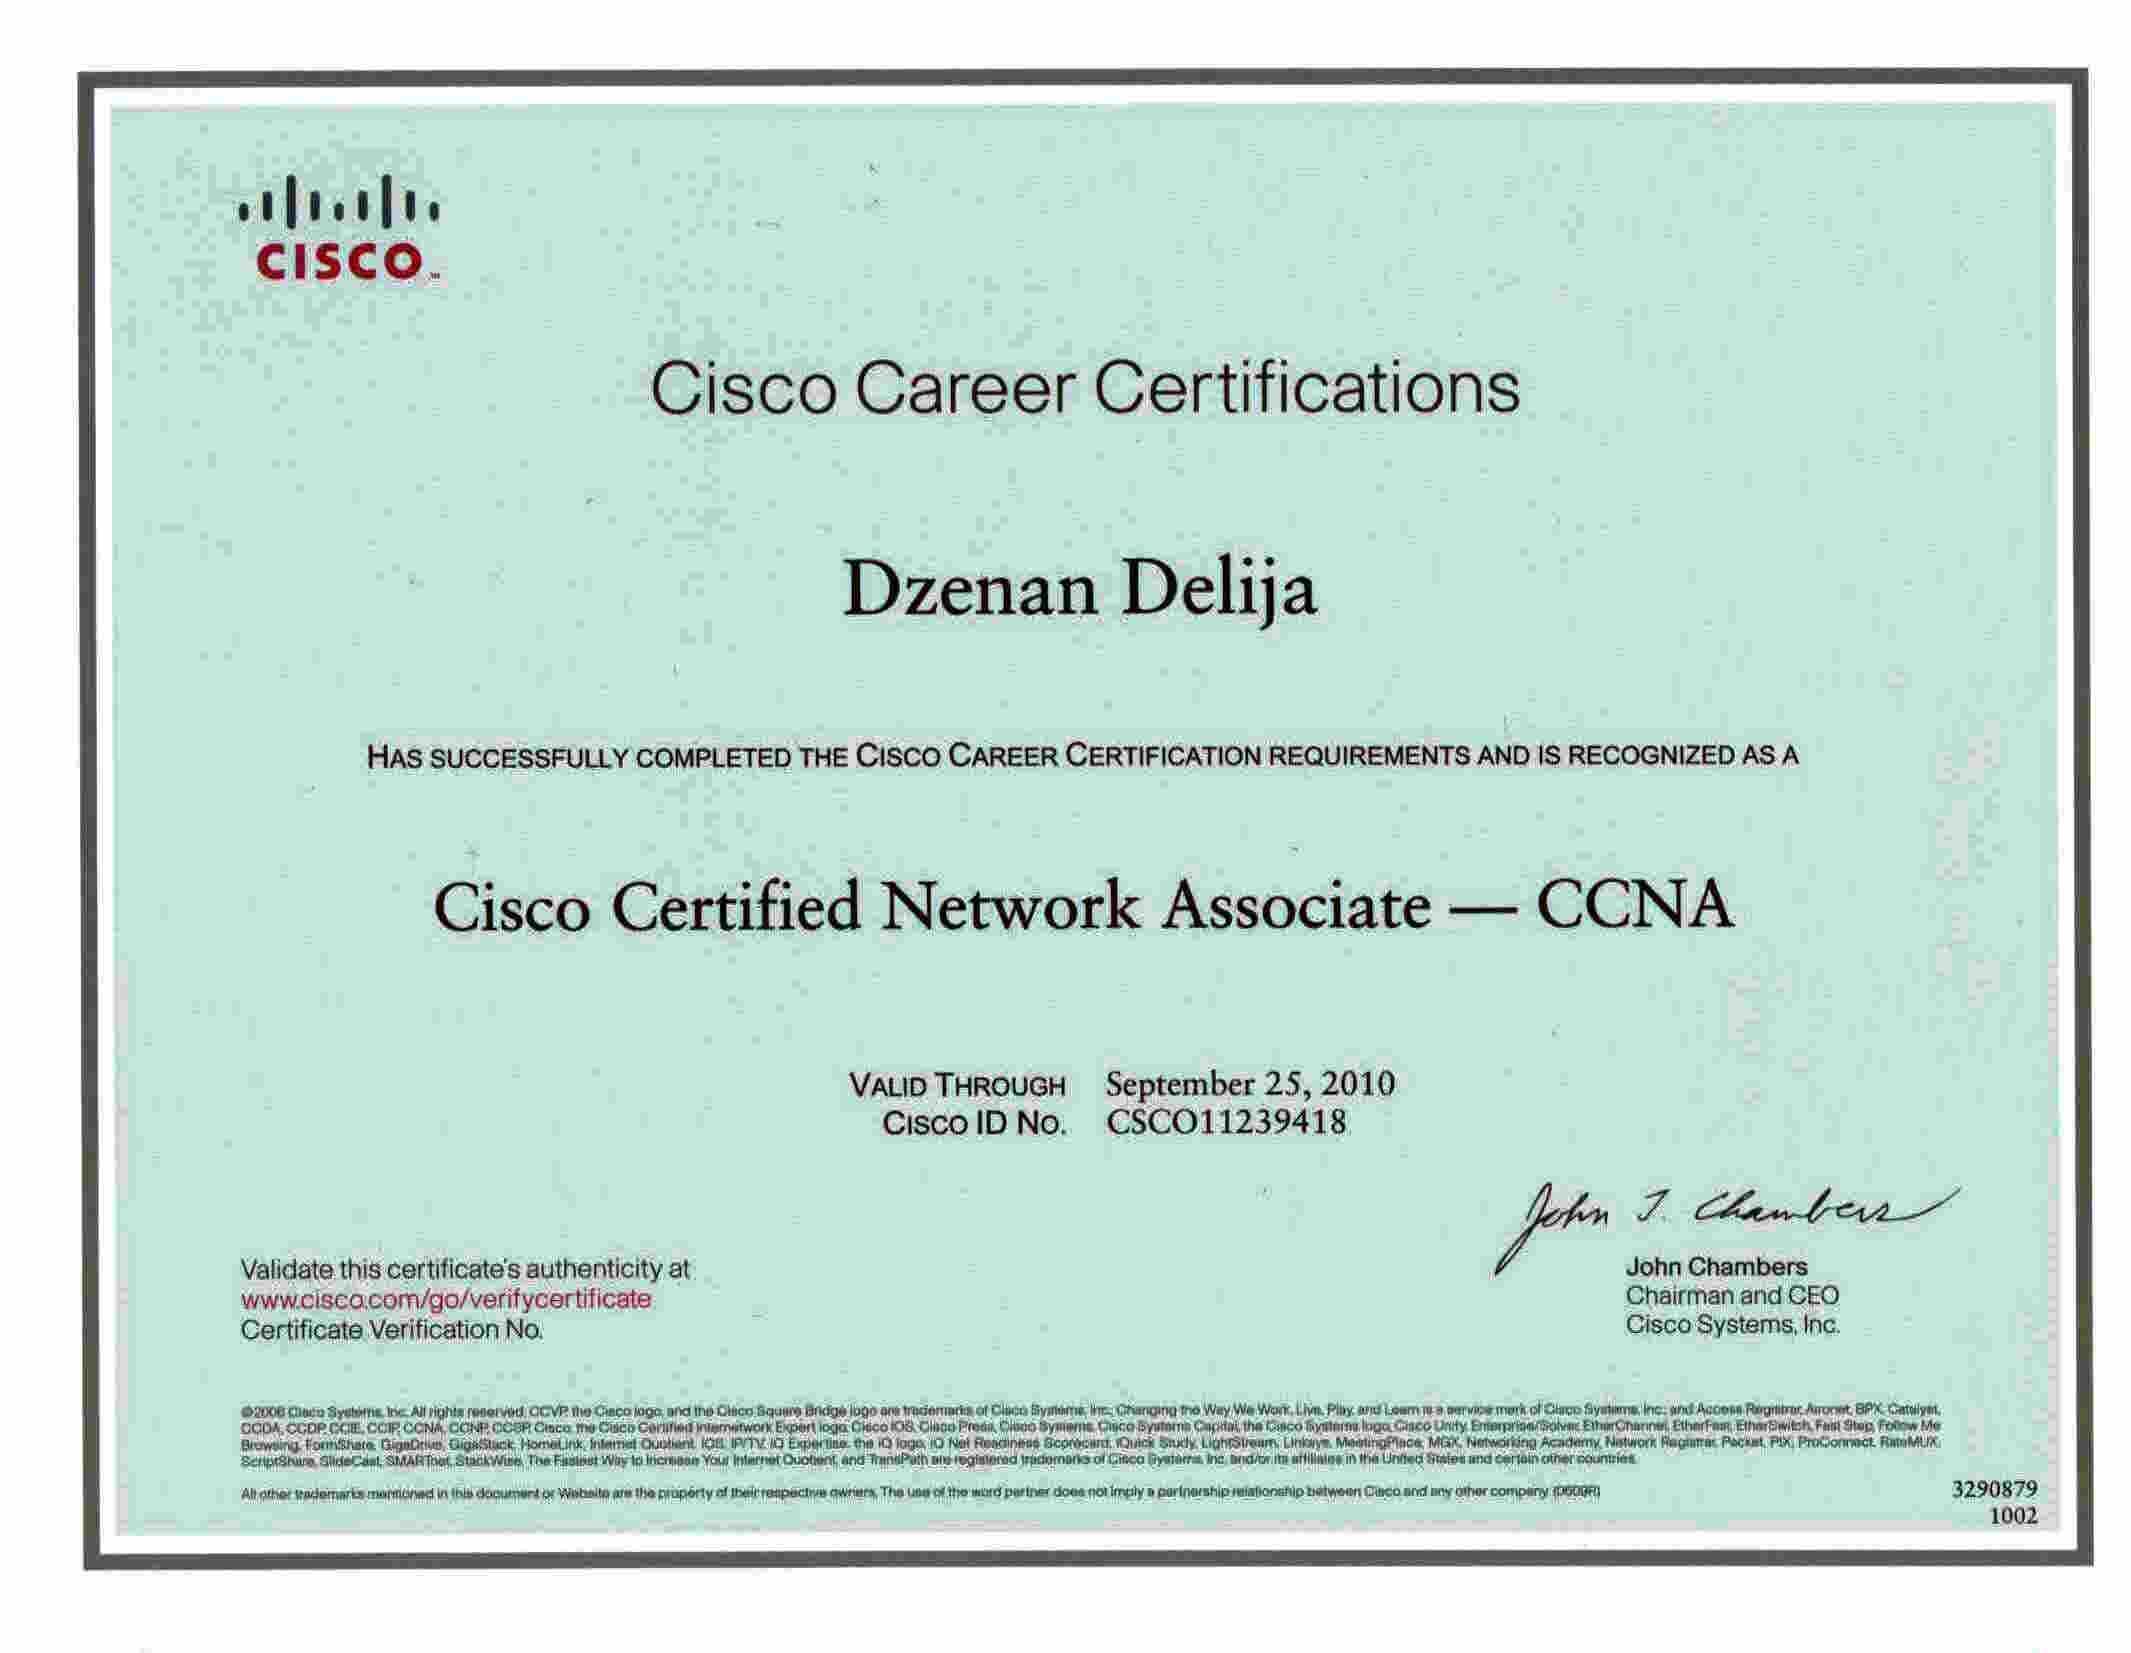 Ccna Certificate Freelancer